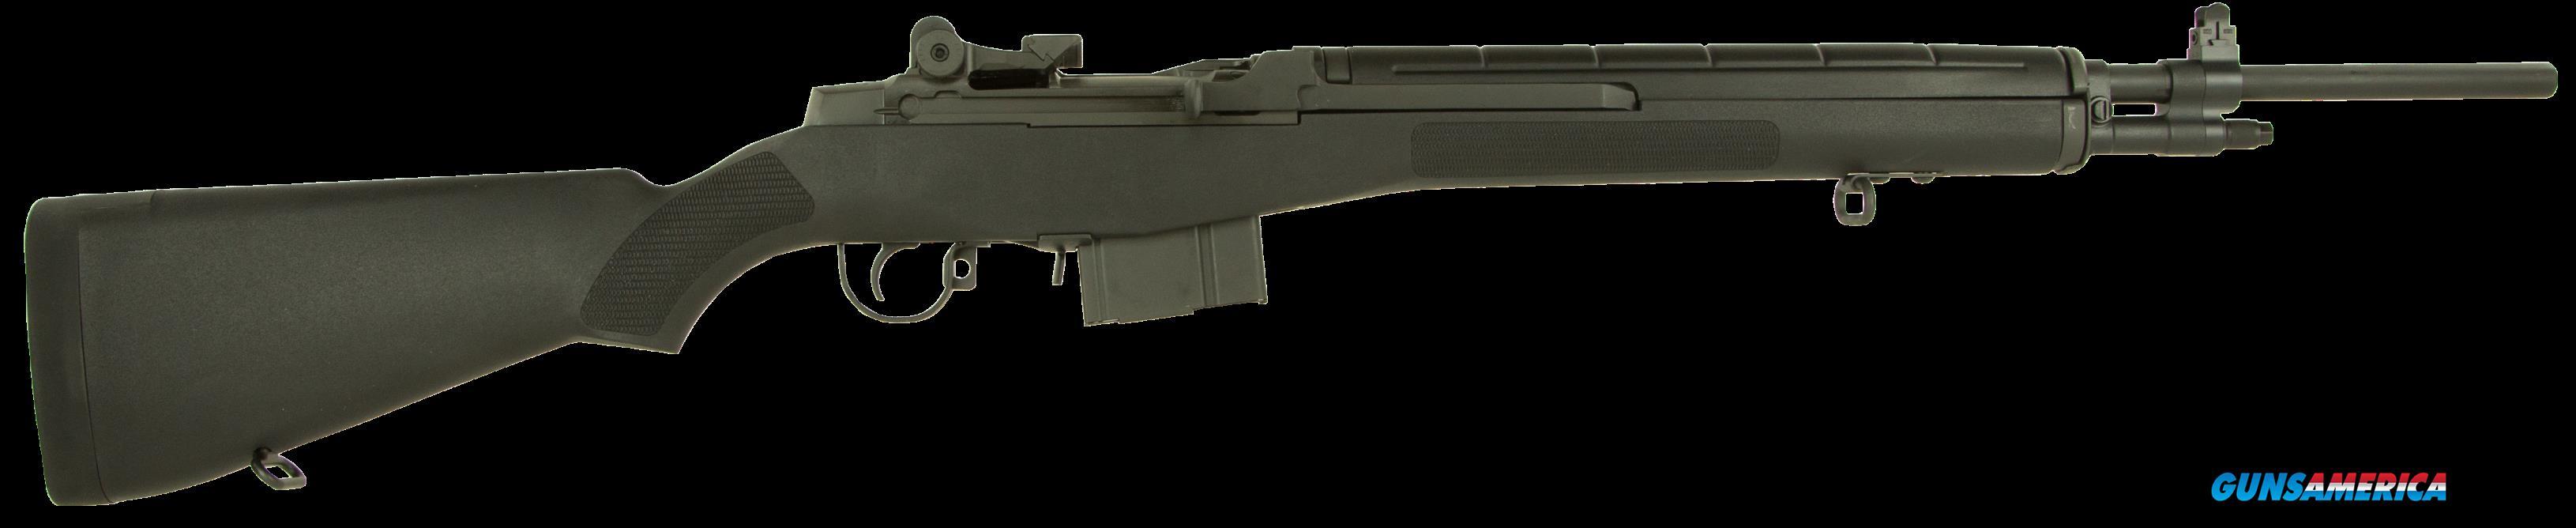 Springfield Armory M1a, Spg Ma9226nt    M1a Ld Std   7.62   Syn     *ny*  Guns > Pistols > 1911 Pistol Copies (non-Colt)